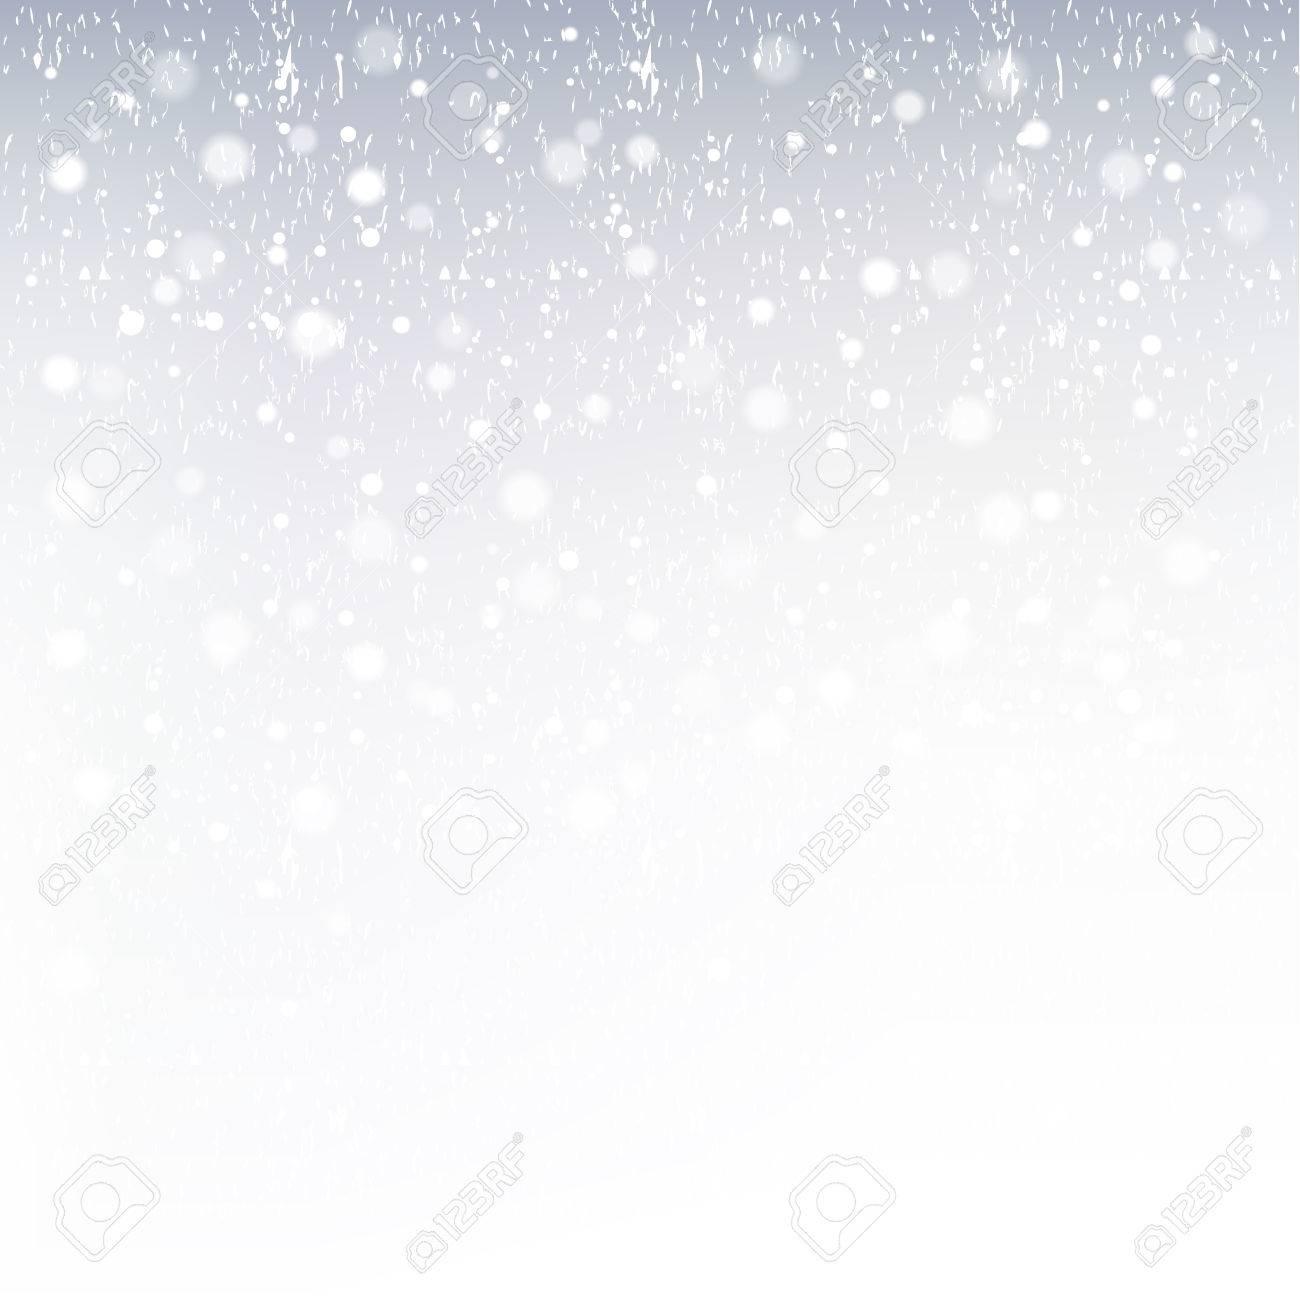 snowing background winter scenery gradient transparency gradient